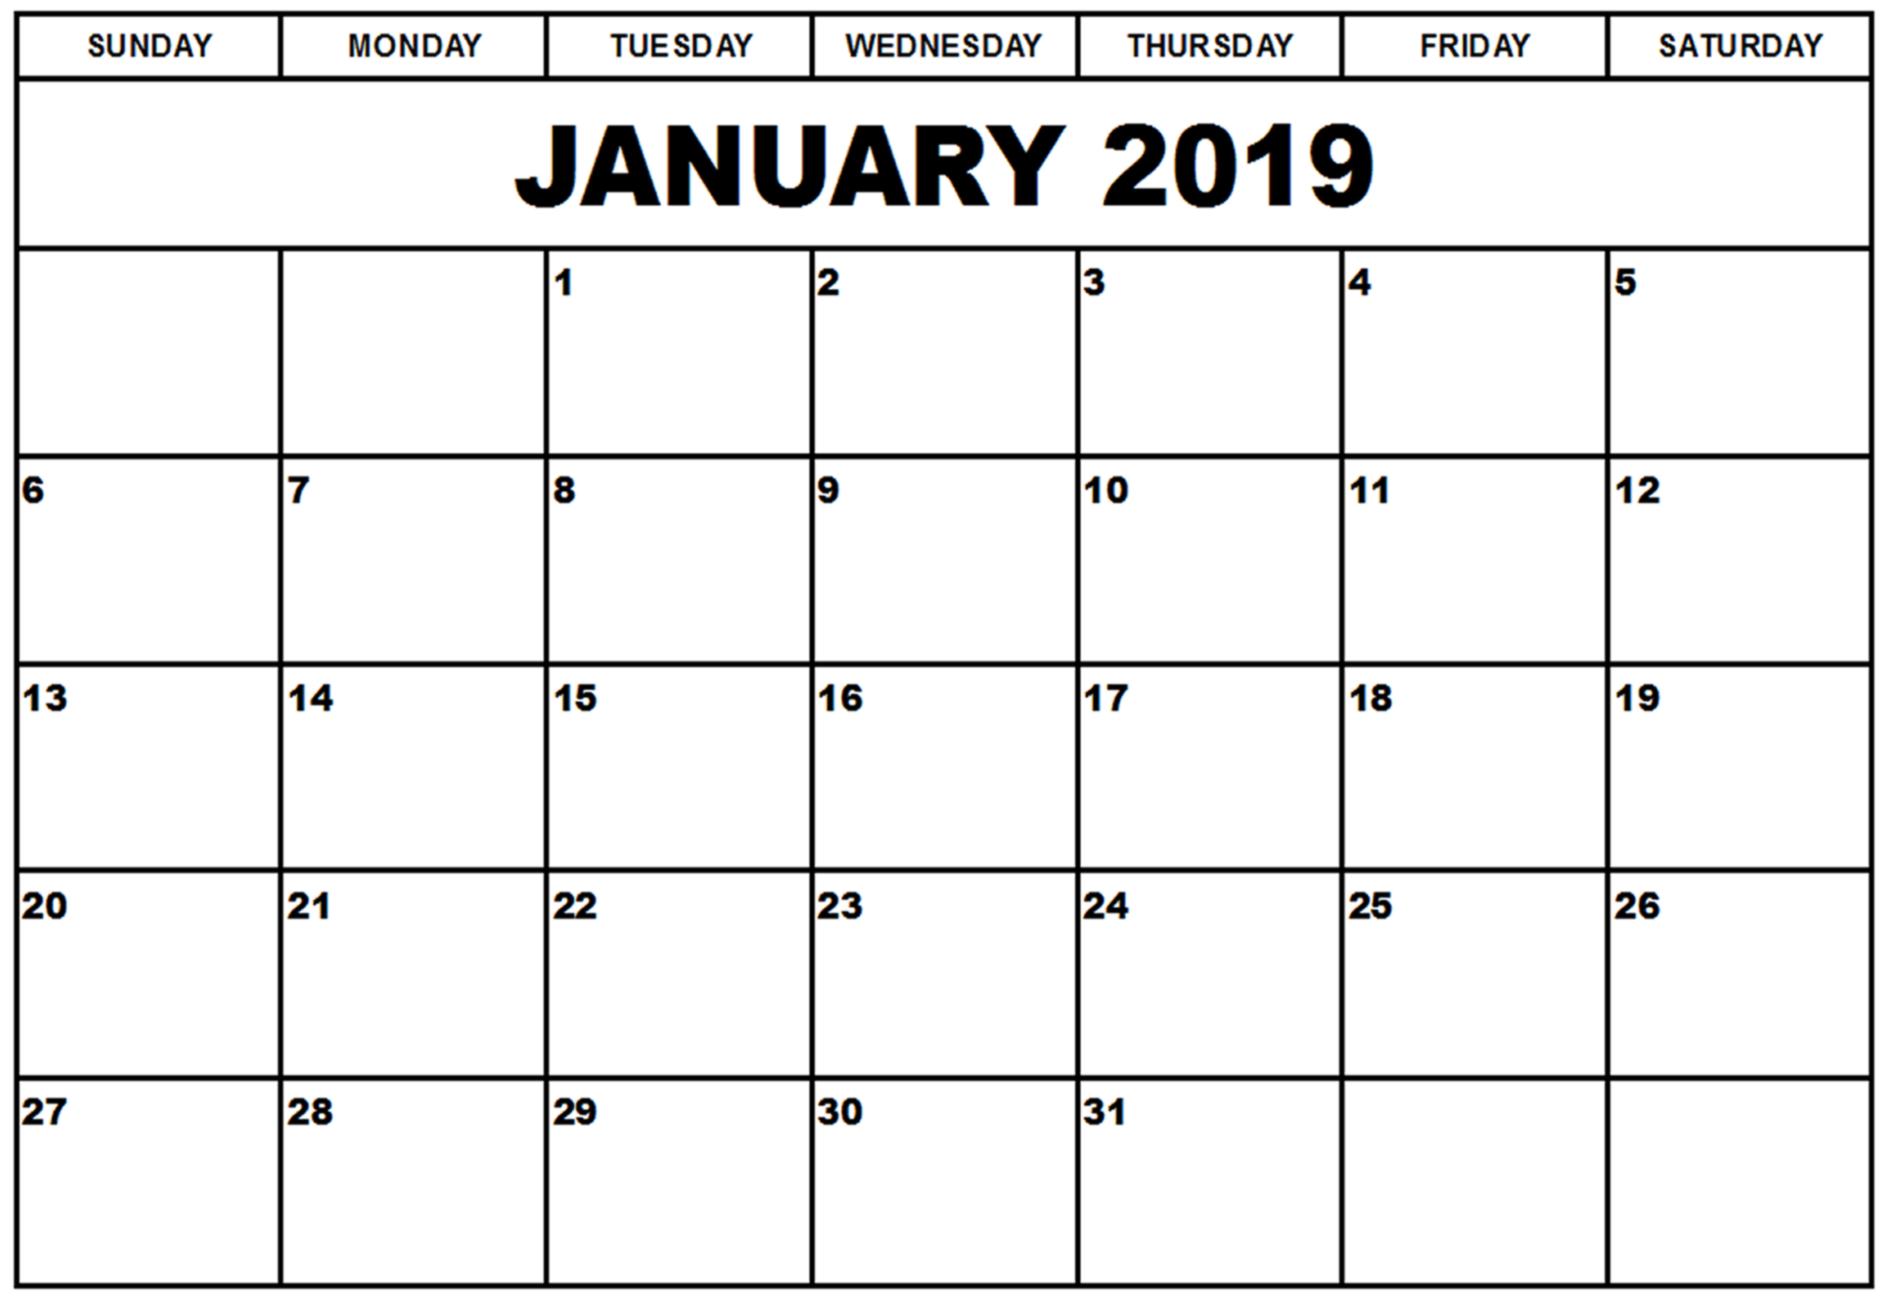 2019 January Calendar Excel - Free Printable Calendar, Blank